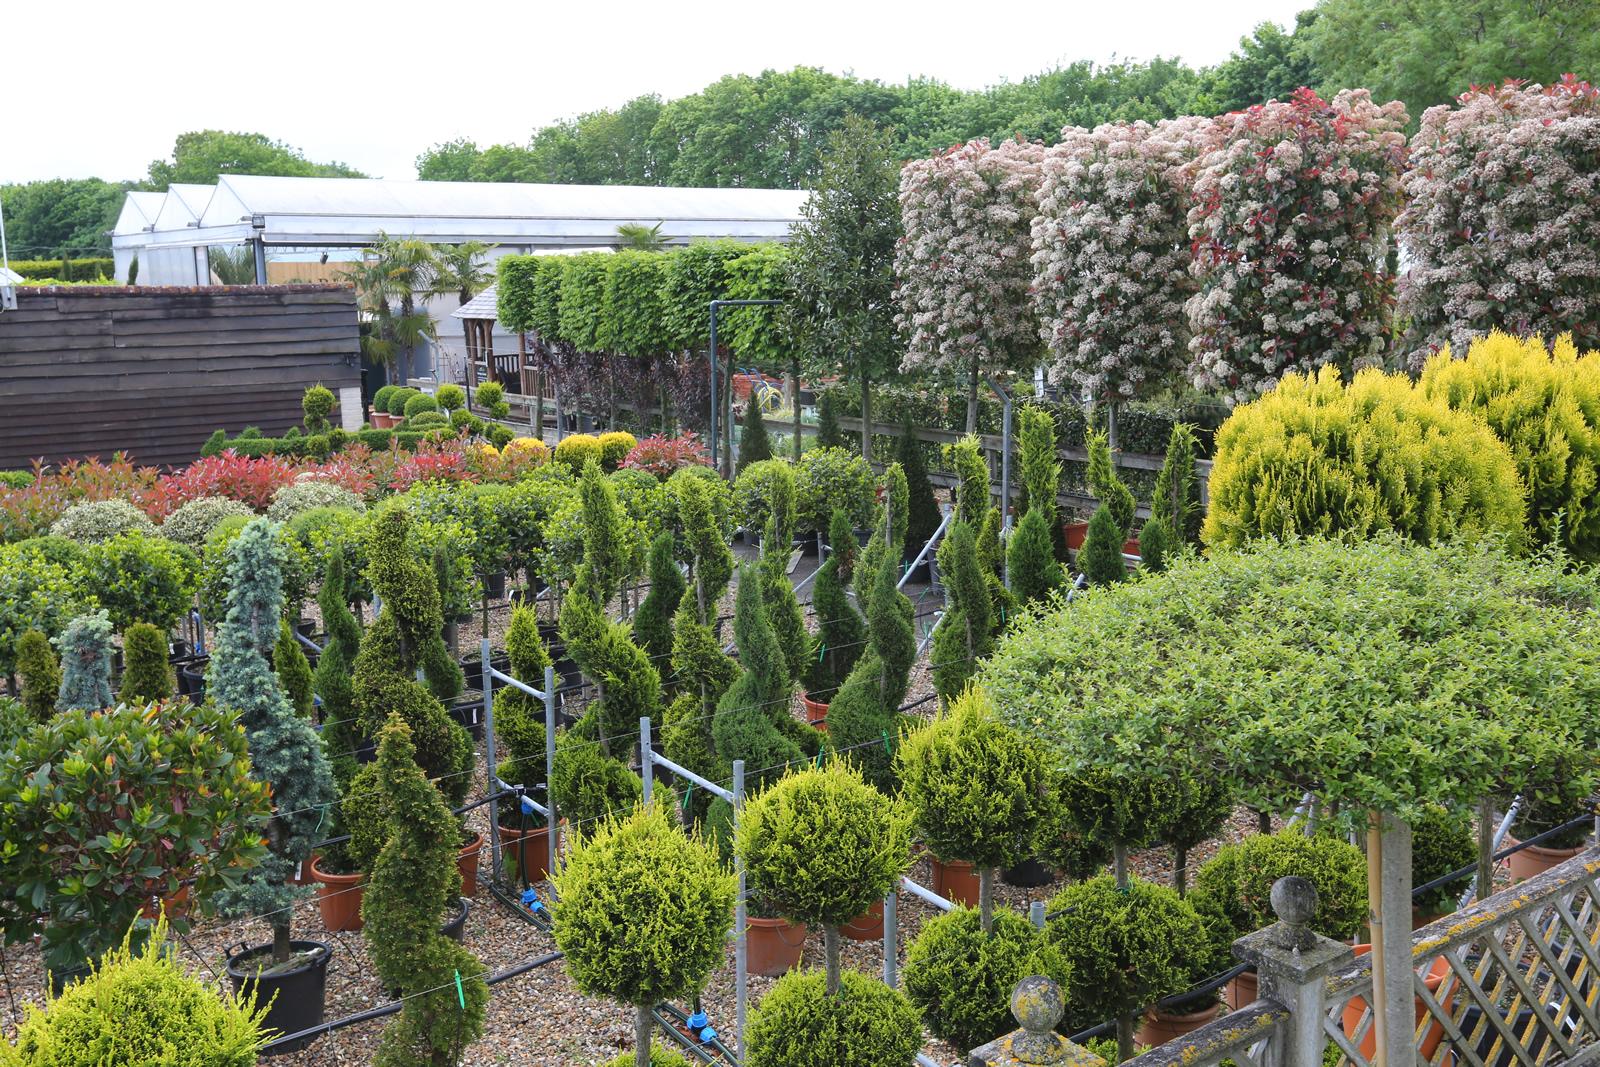 Specimen plants at Clifton Nurseries - Addlestone Weybridge Garden Centre